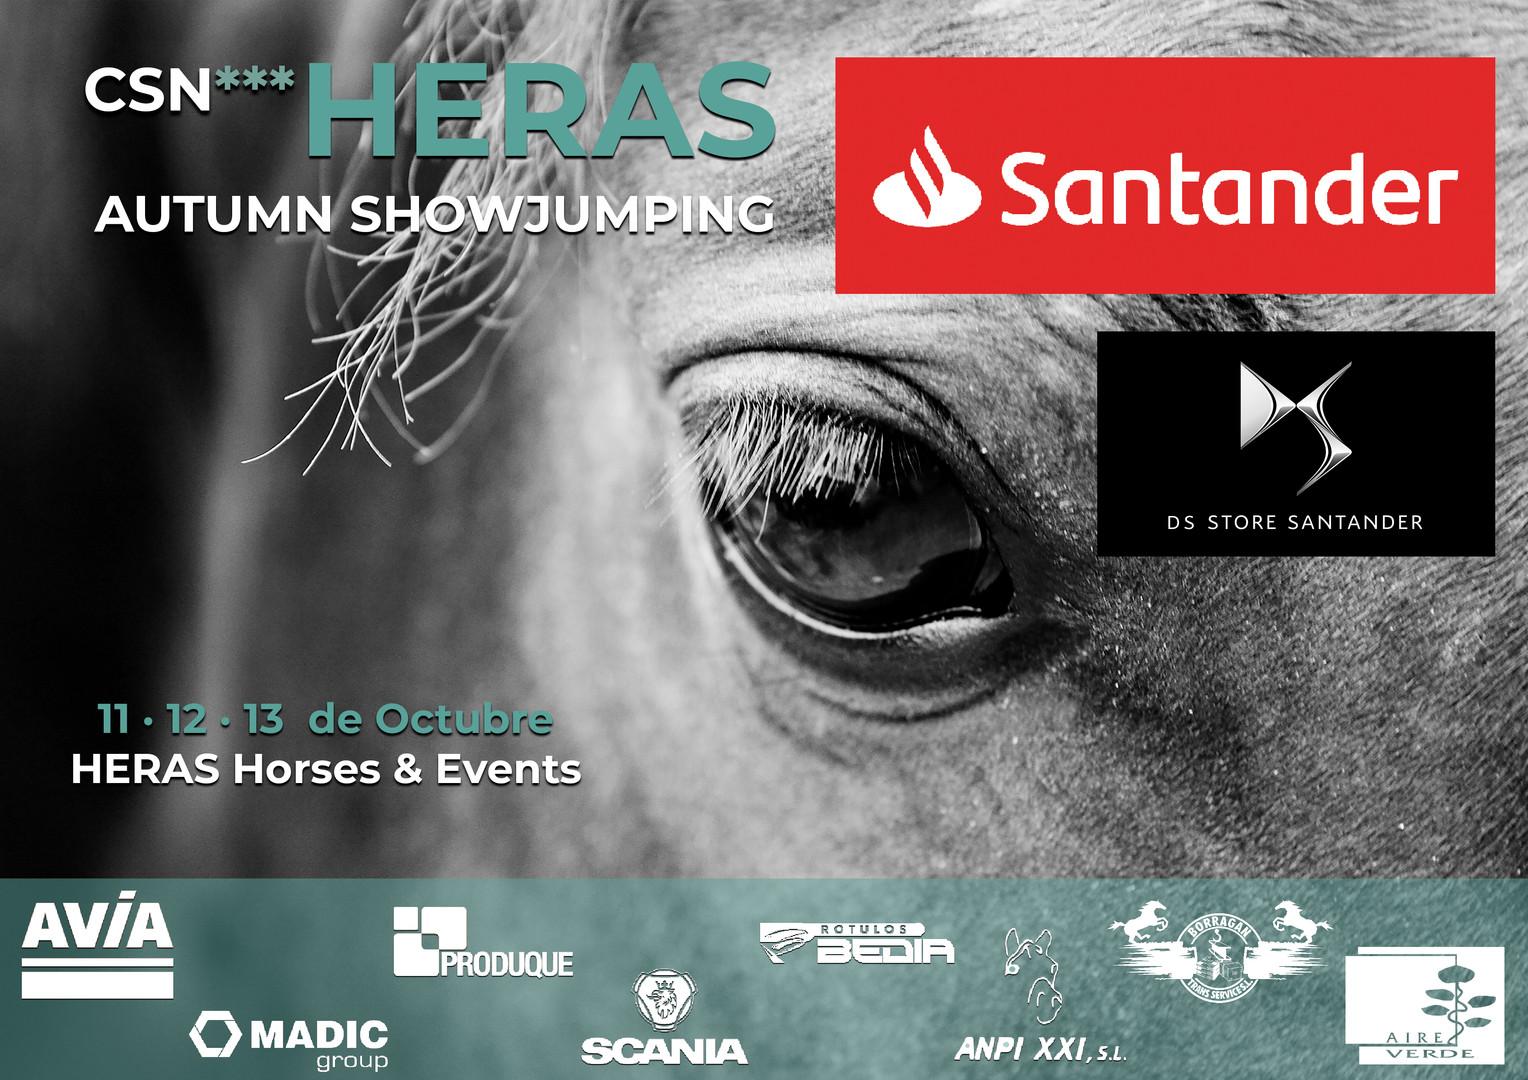 Cartel CSN3 11-13 Octubre_HERAS Horses&E